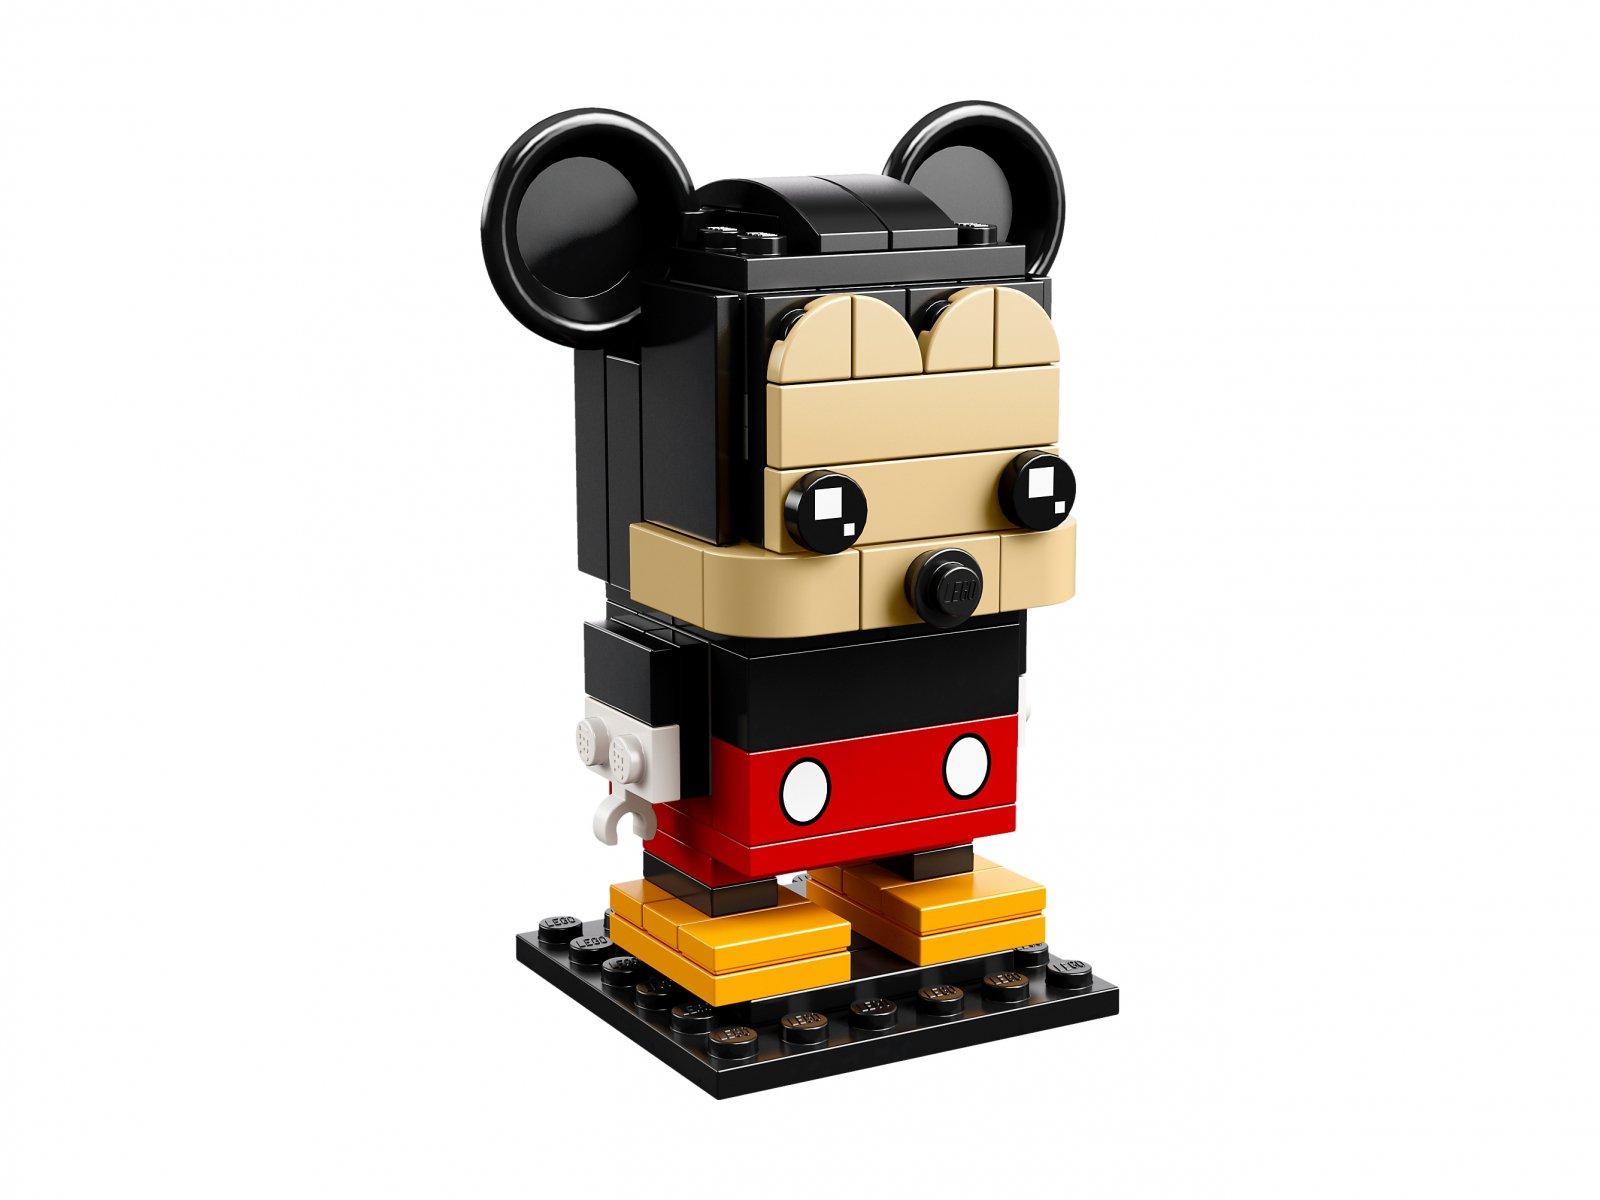 LEGO BrickHeadz 41624 Myszka Miki